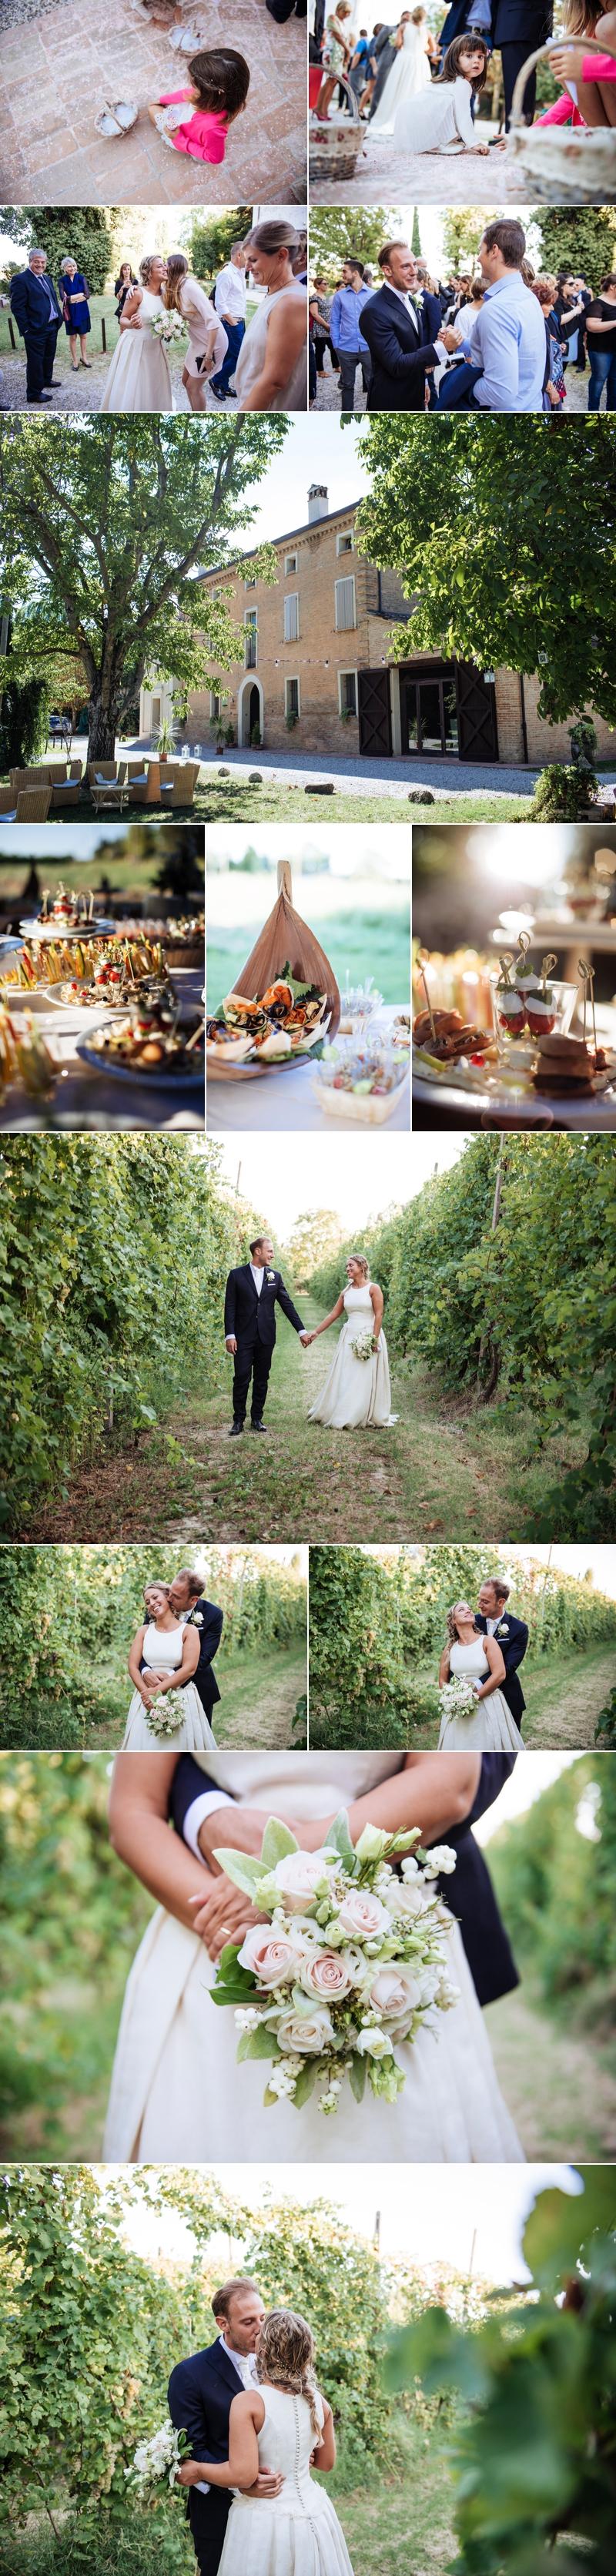 fotografo-matrimonio-forli-cesena-palazzo-baldini-bagnacavallo-ravenna3